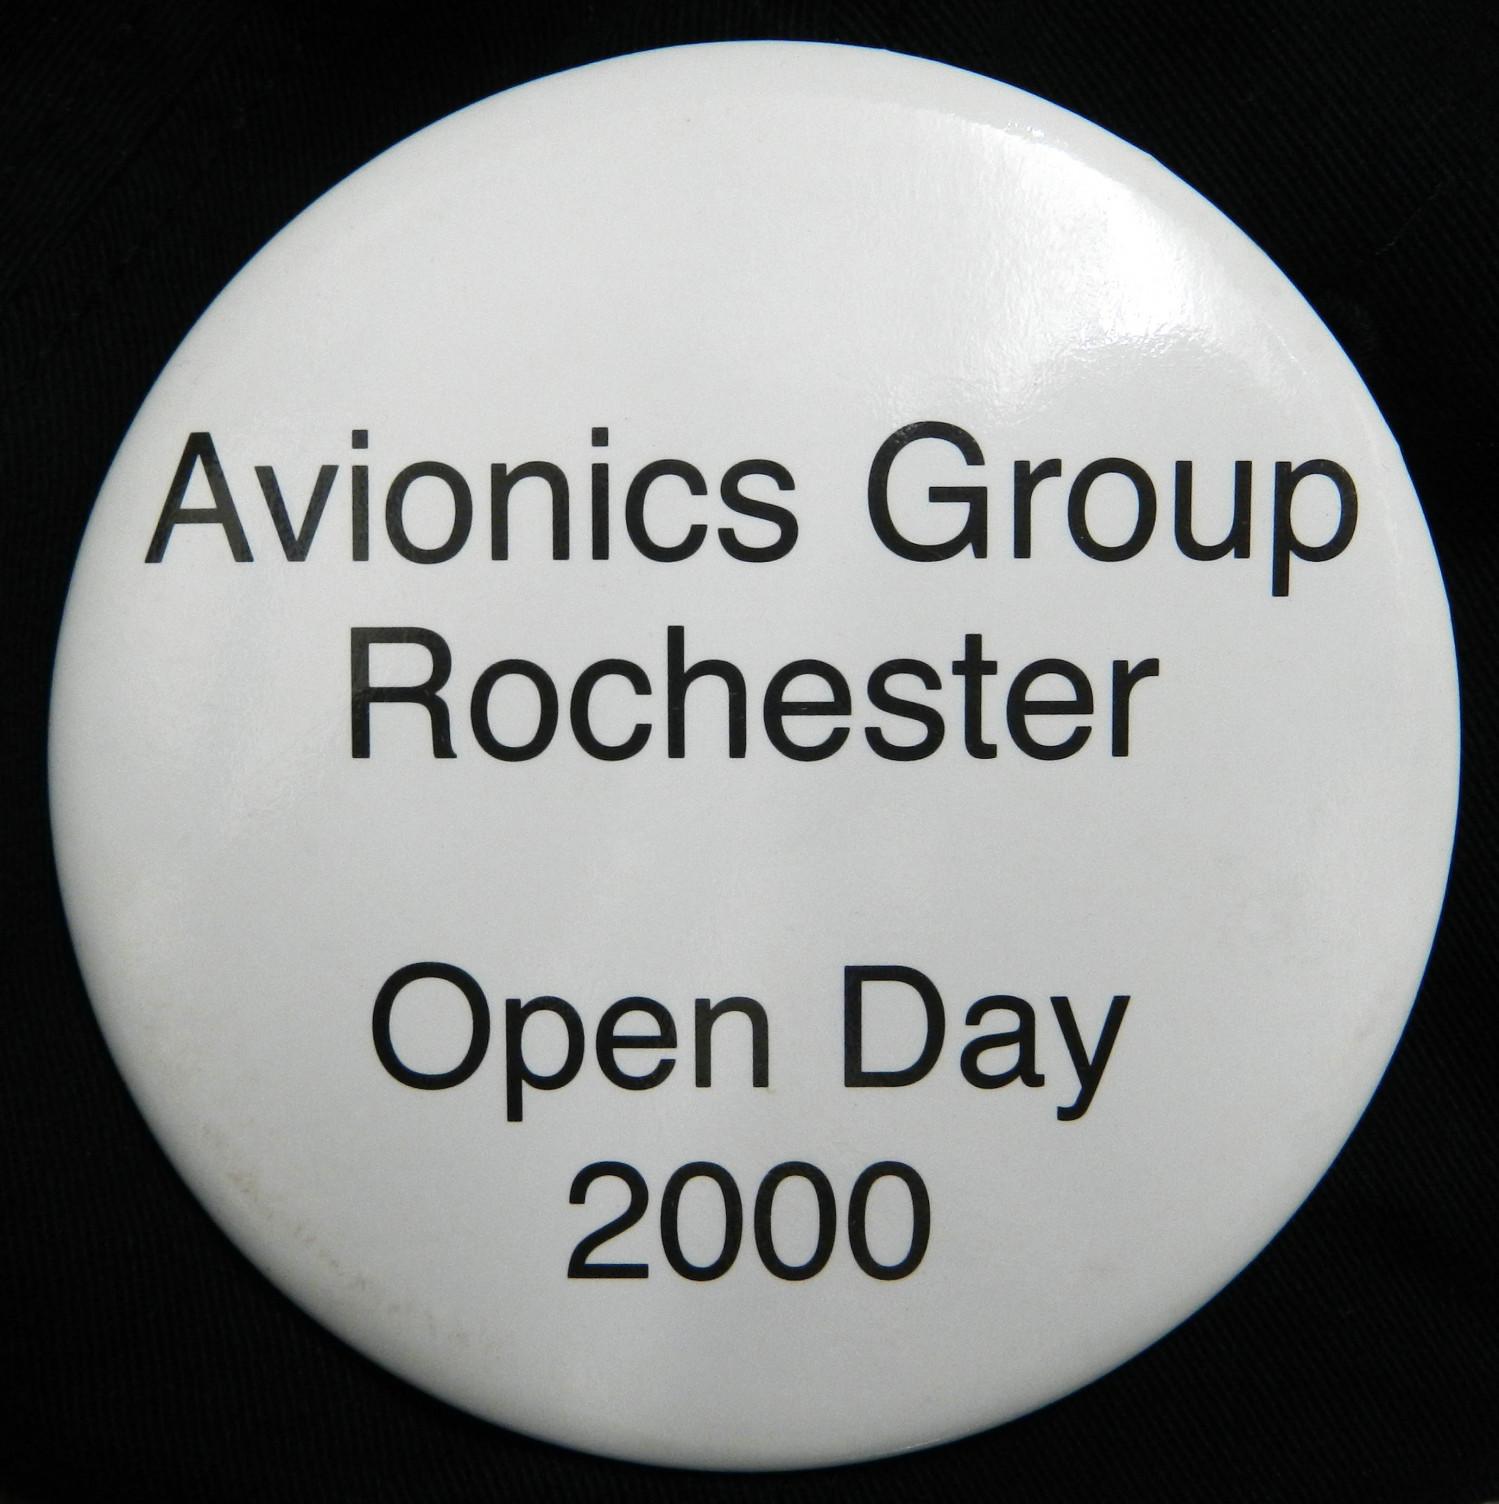 Avionics Group Rochester Badge